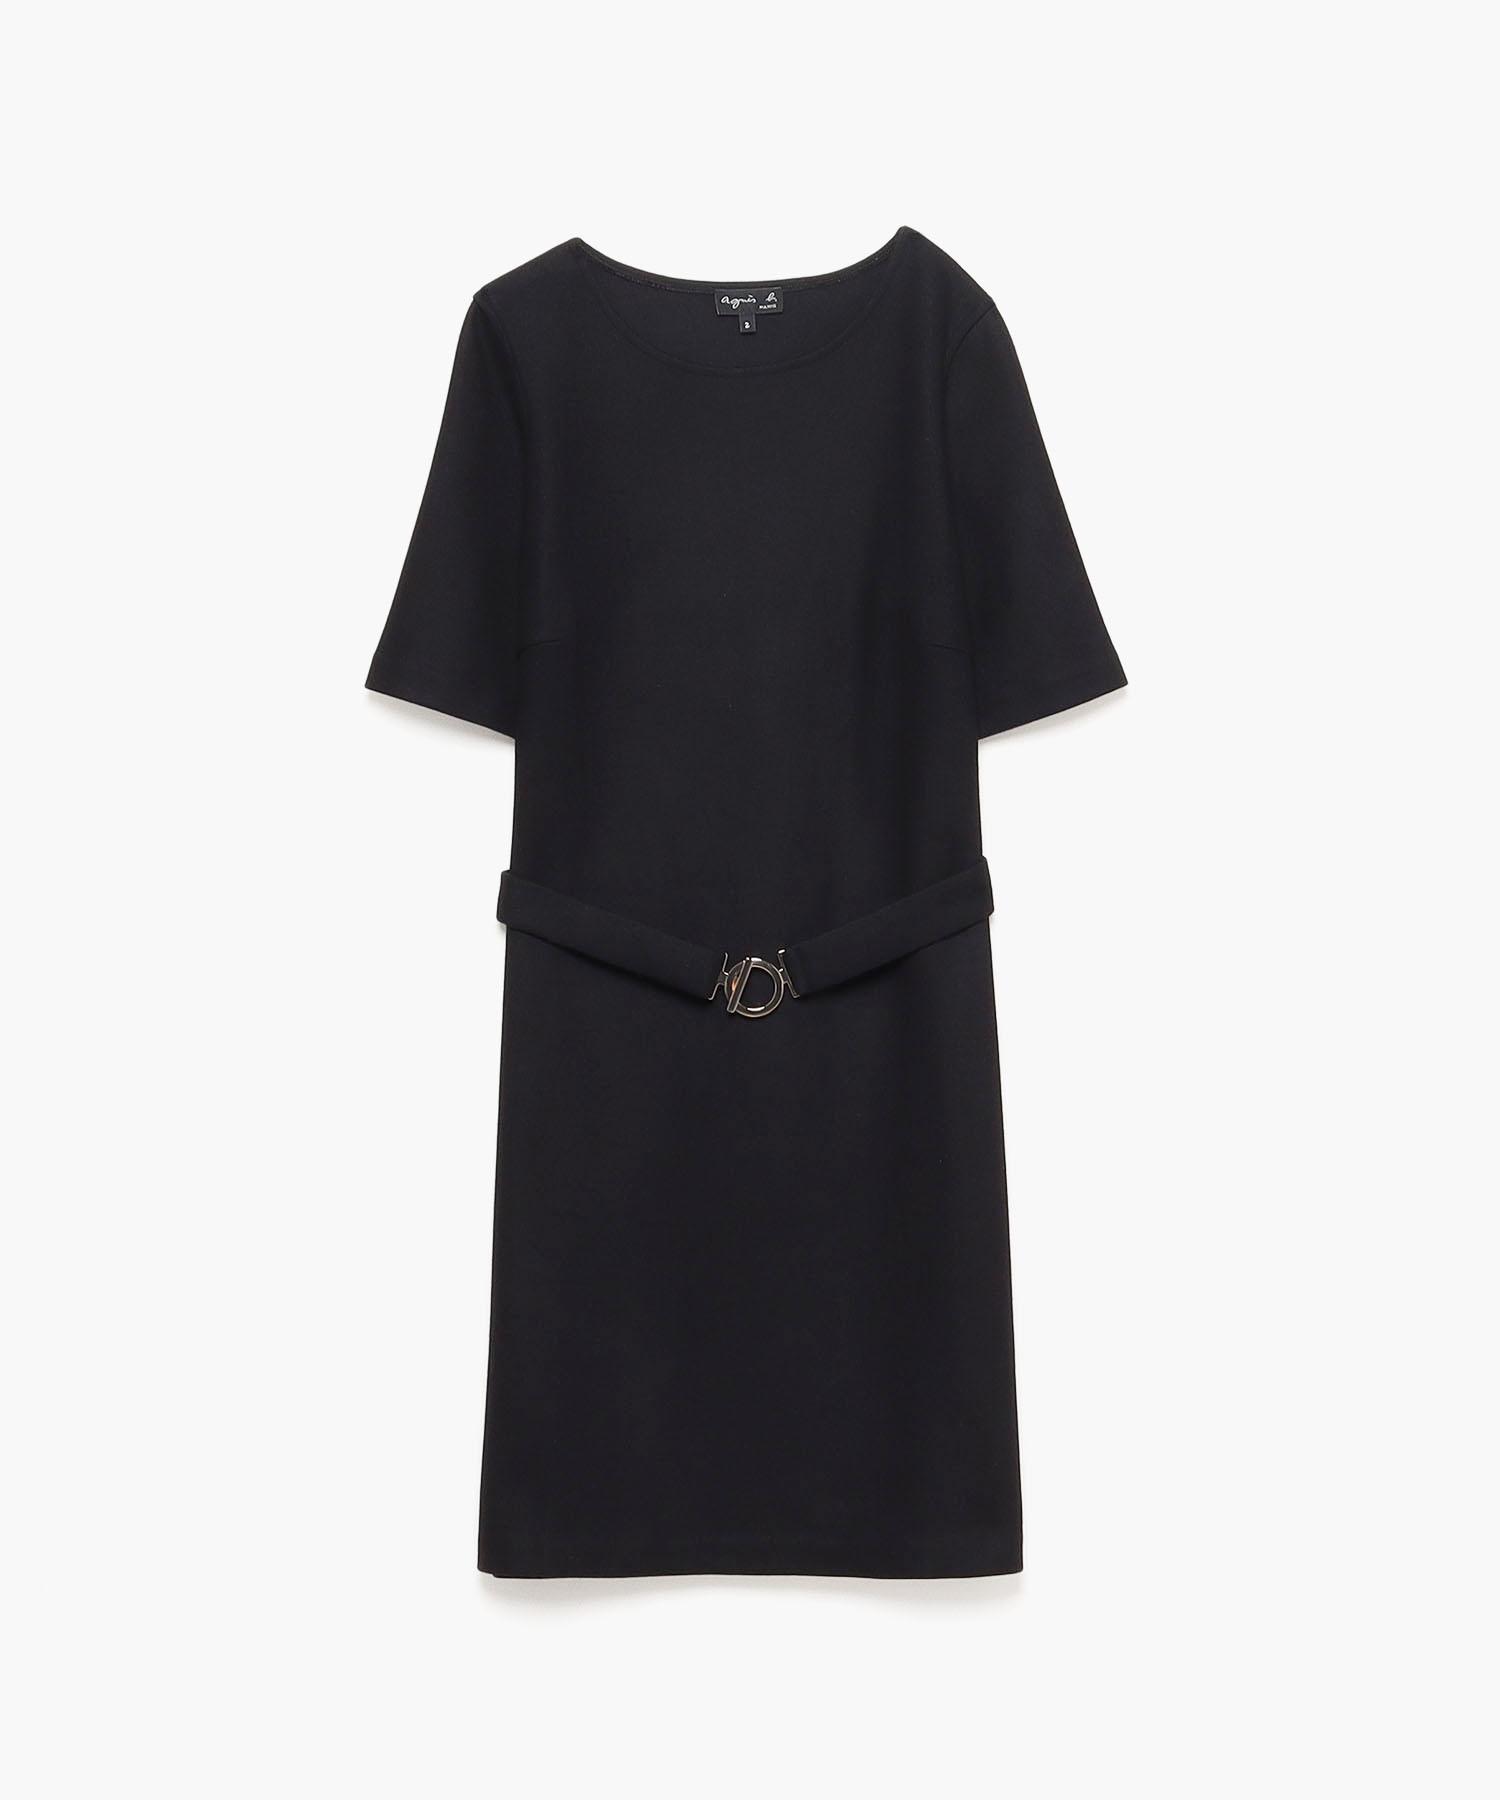 JBB9 ROBE ウールベルテッドドレス